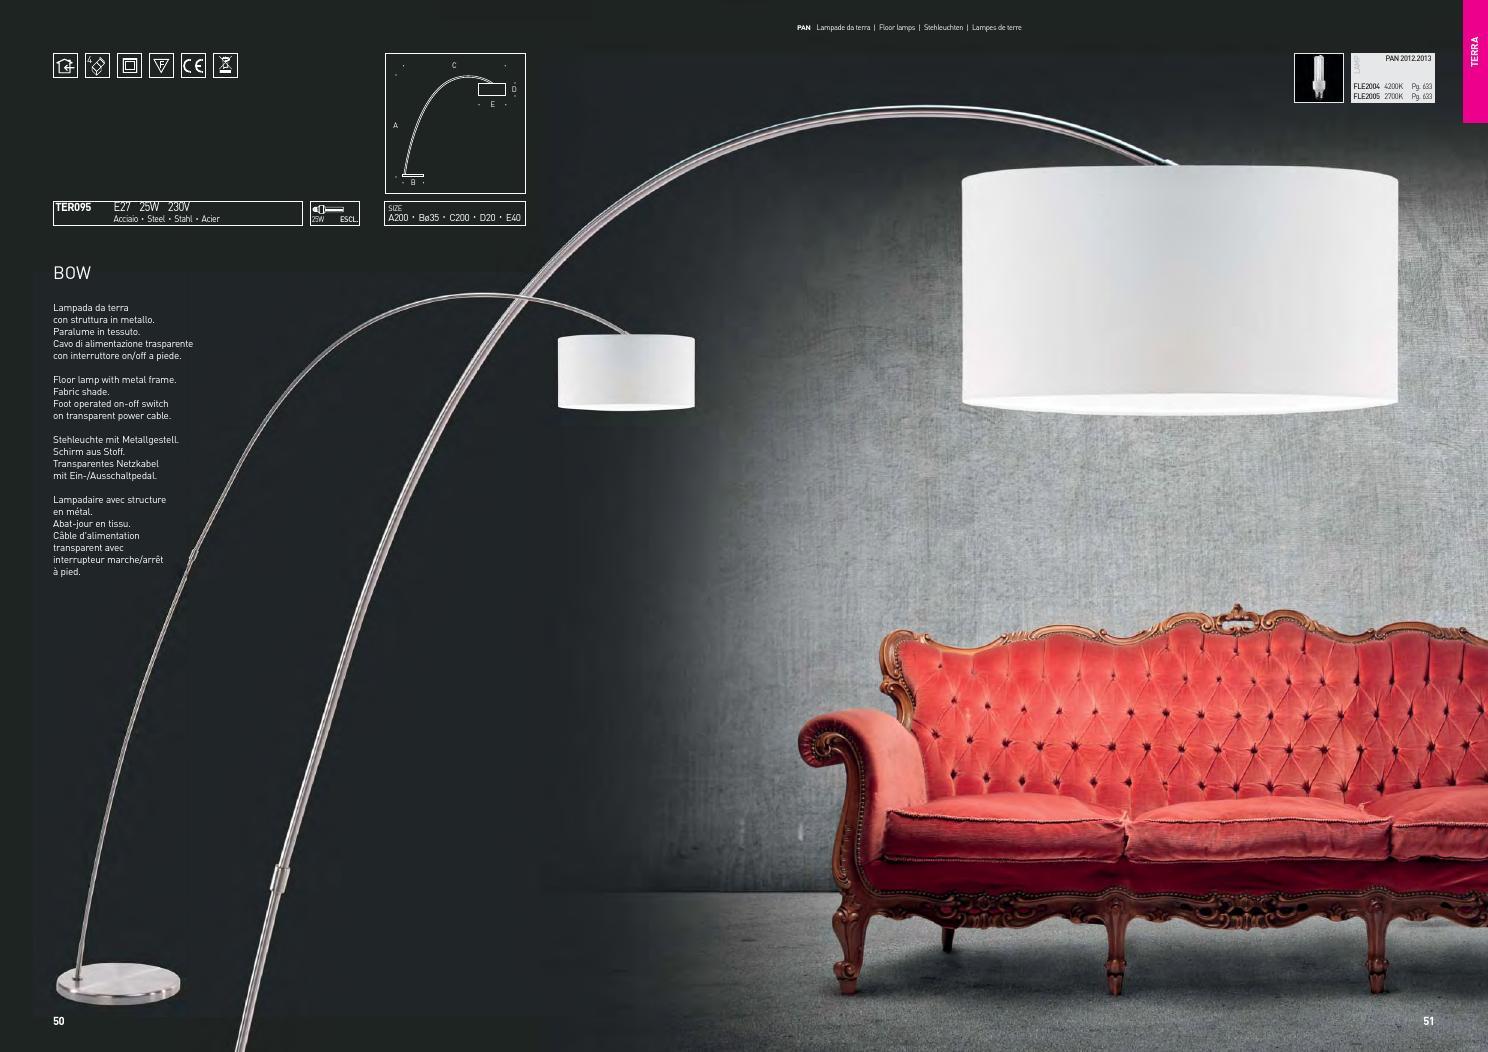 Lampada Da Studio Design pan 2012-2013 by Фрезия-Лайт - issuu